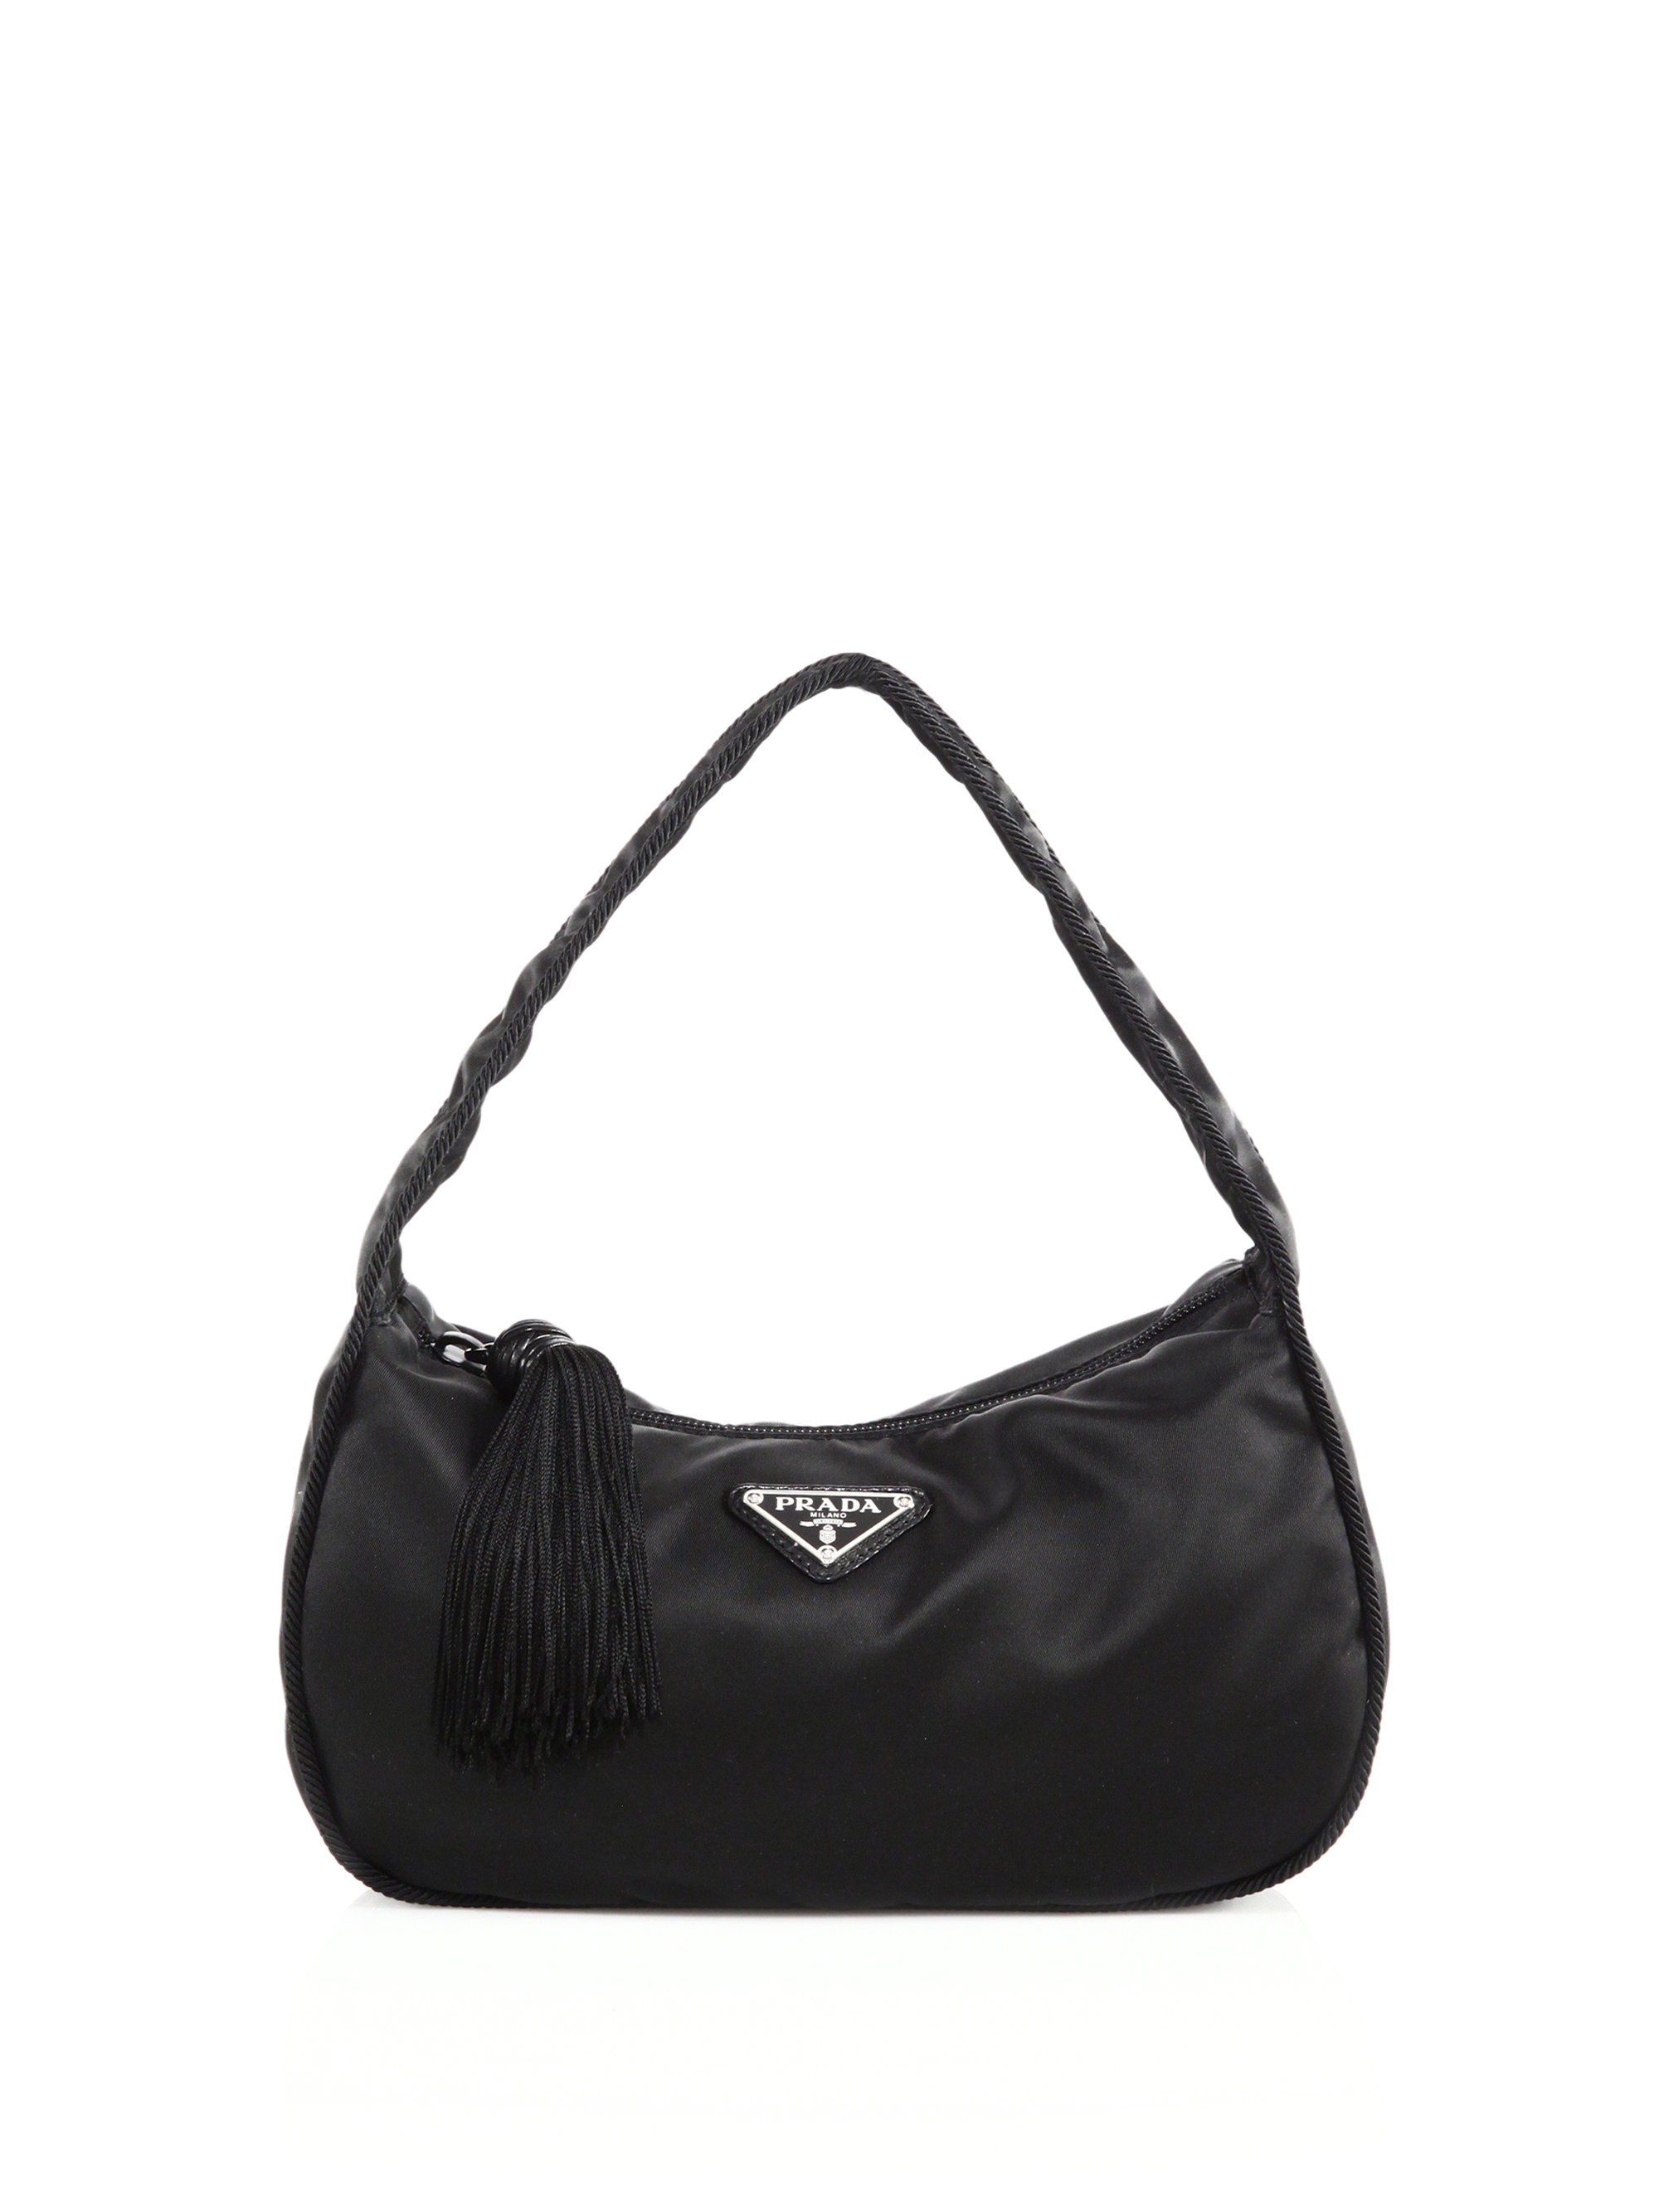 118b21664862 Lyst - Prada Nylon Crescent Shoulder Bag in Black